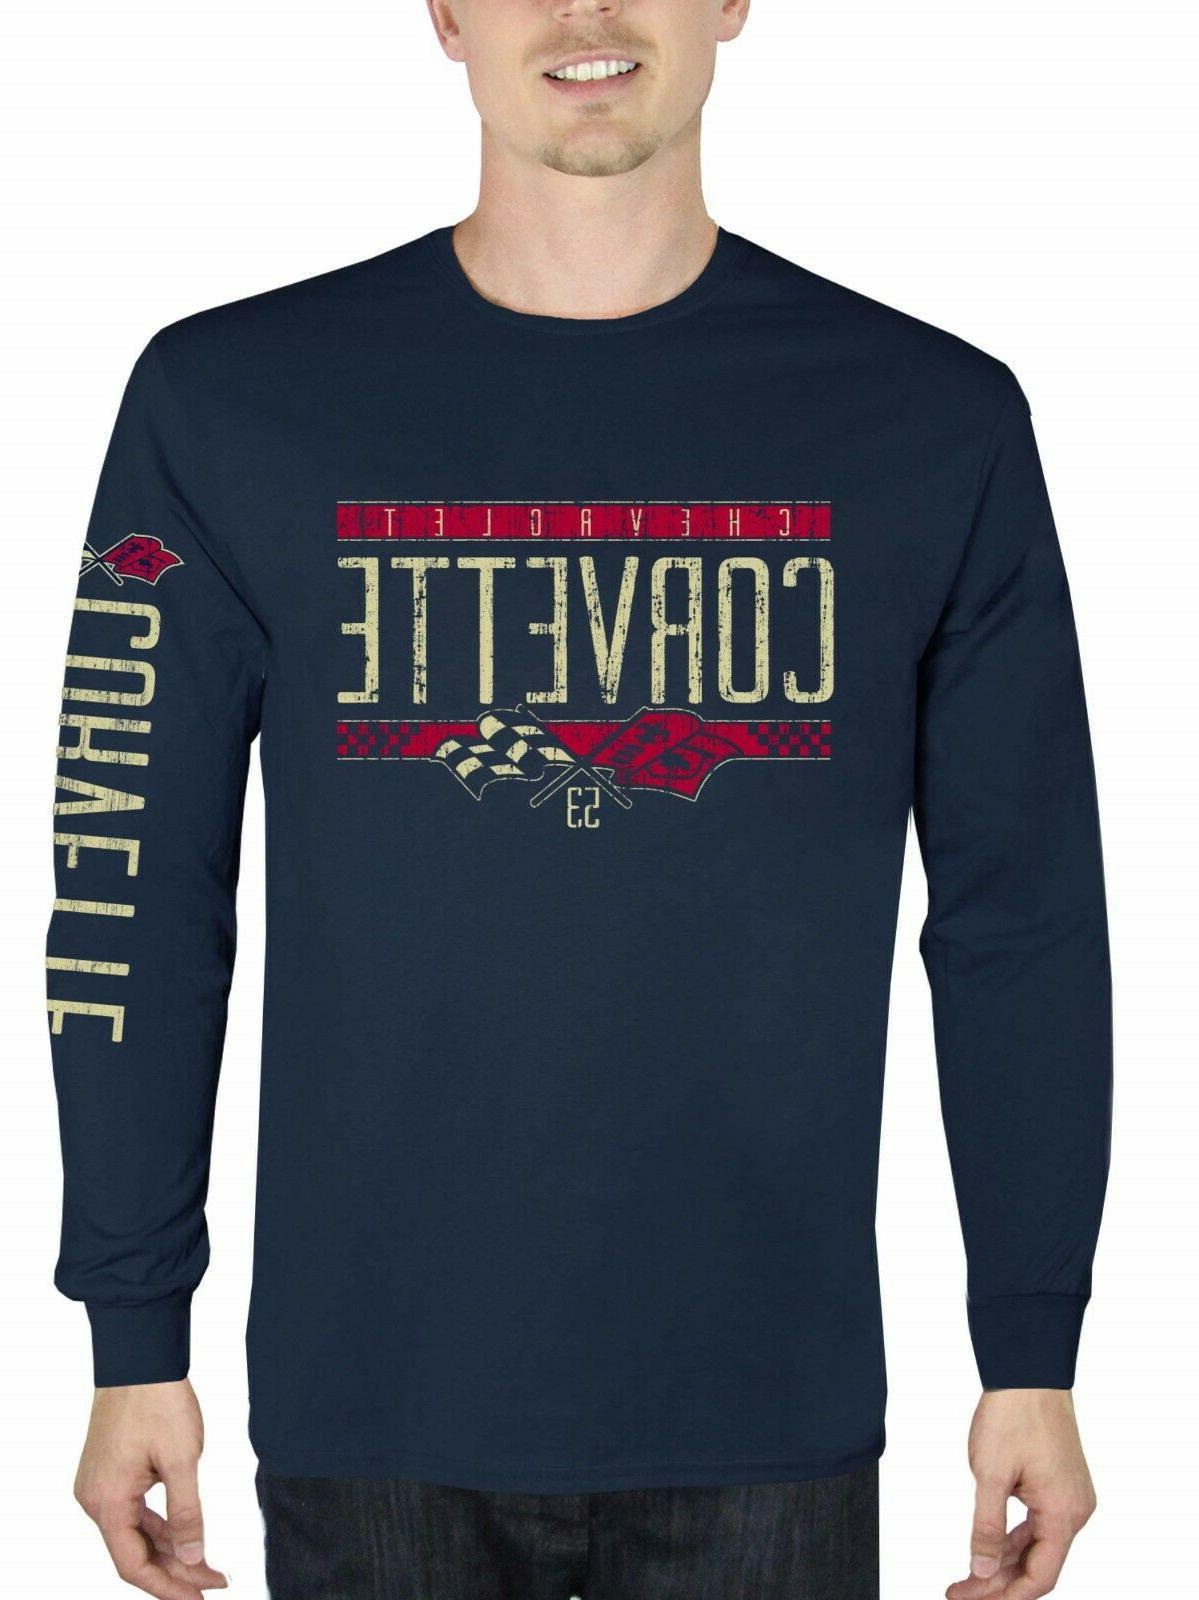 nwt chevrolet corvette shirt long sleeve navy